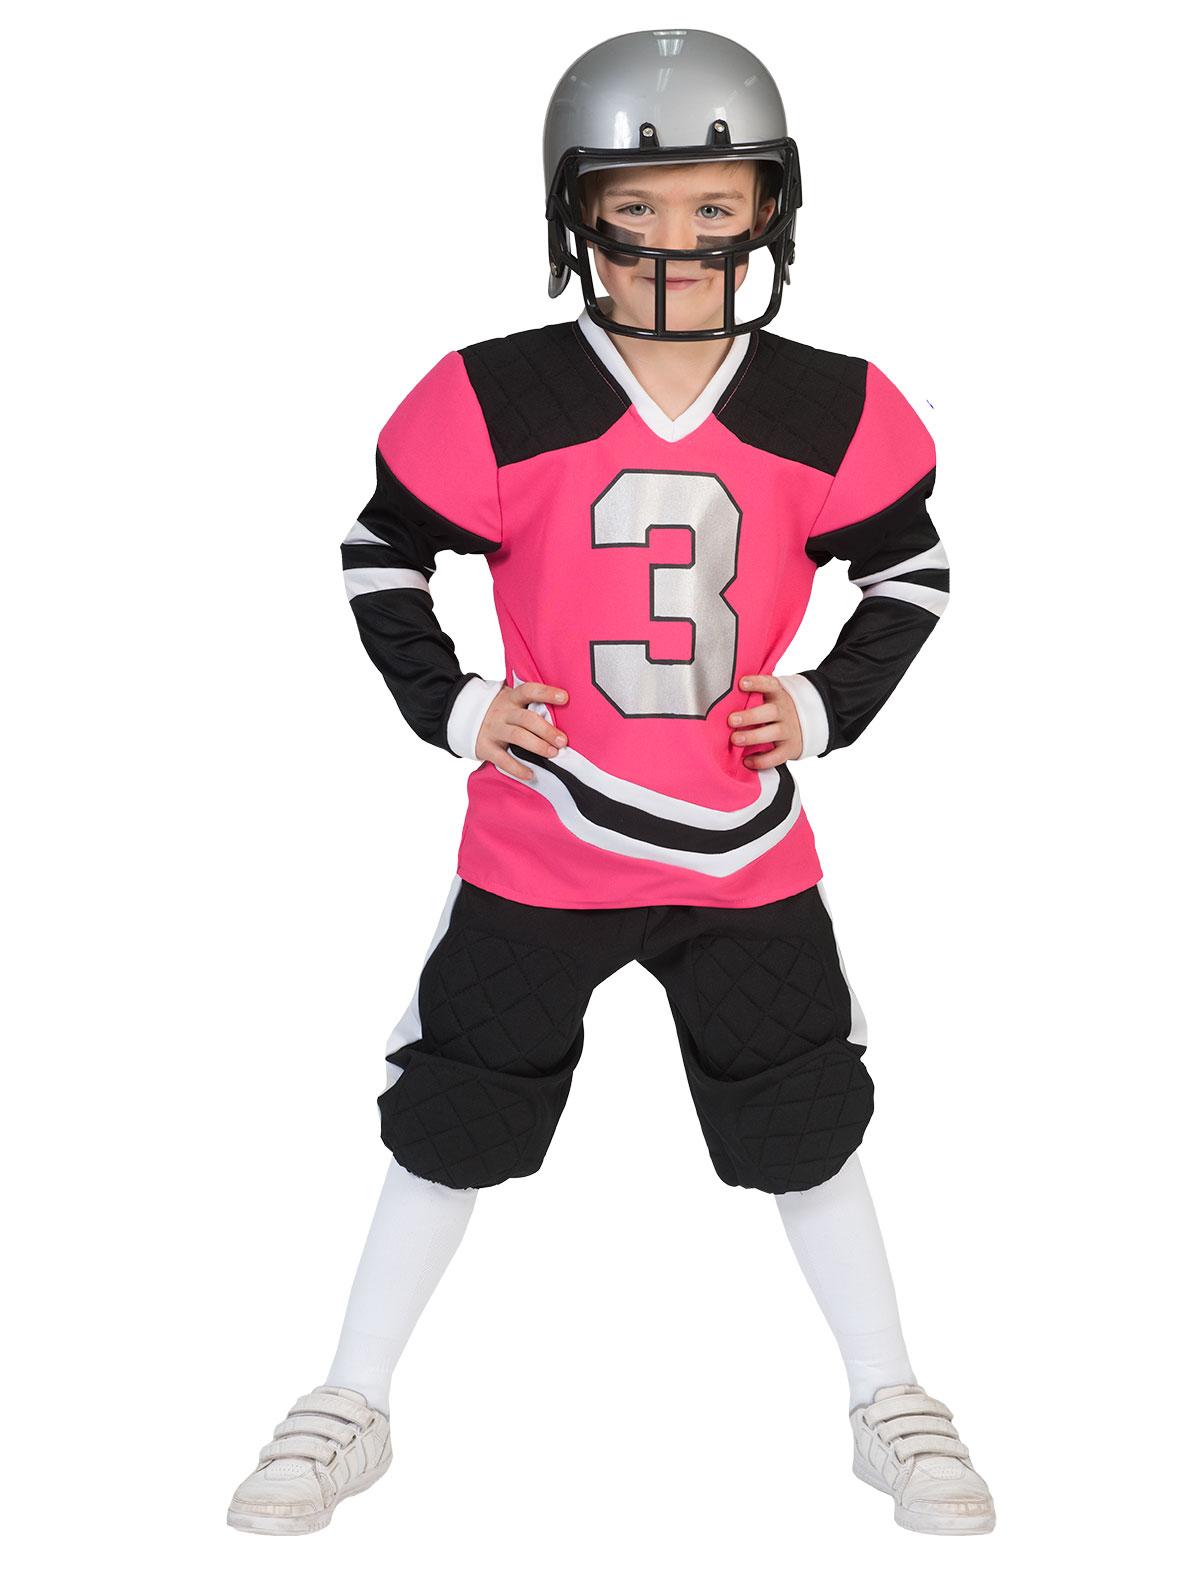 Footballer Haley Kind